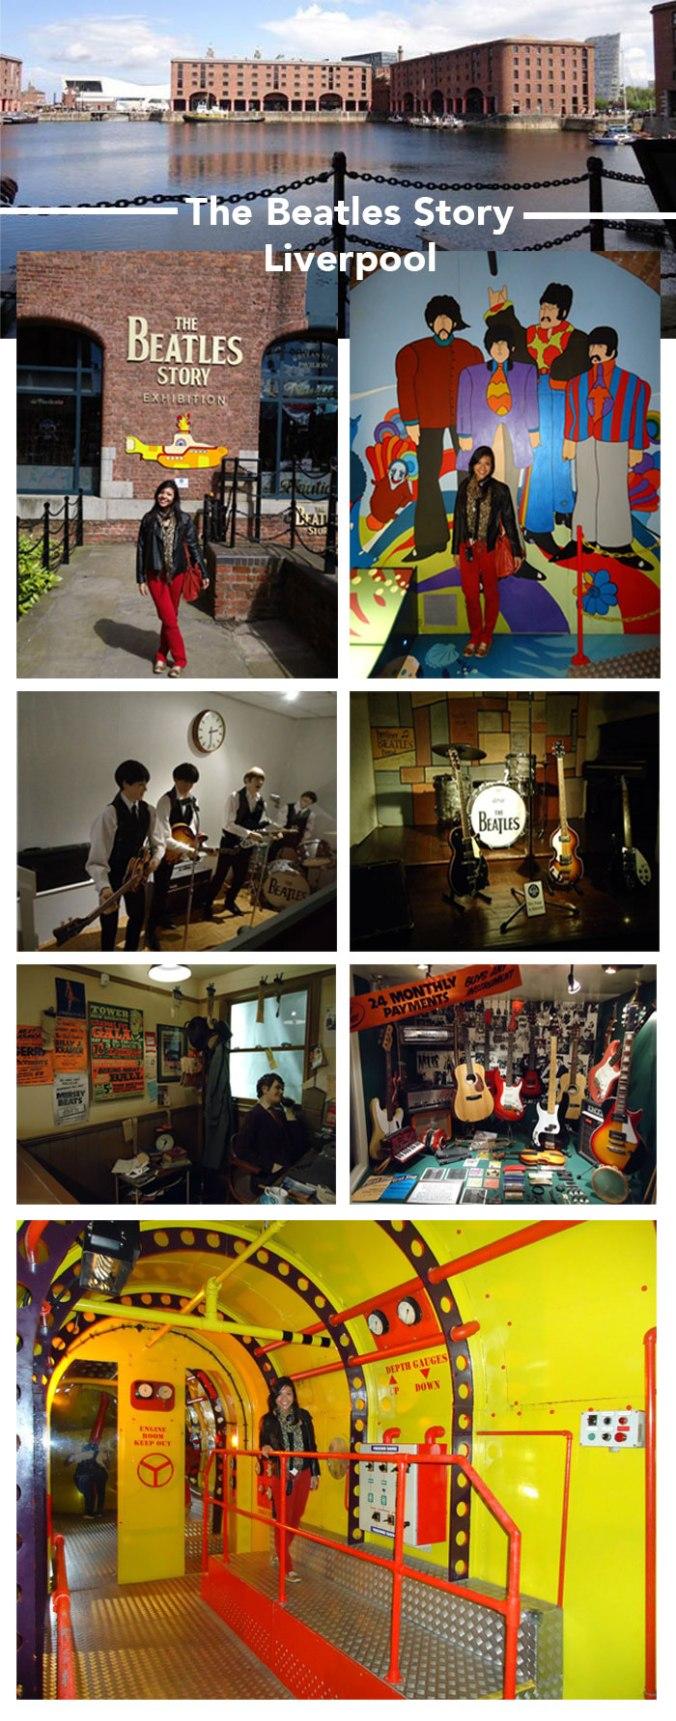 museu-beatles-japa-viajante-liverpool